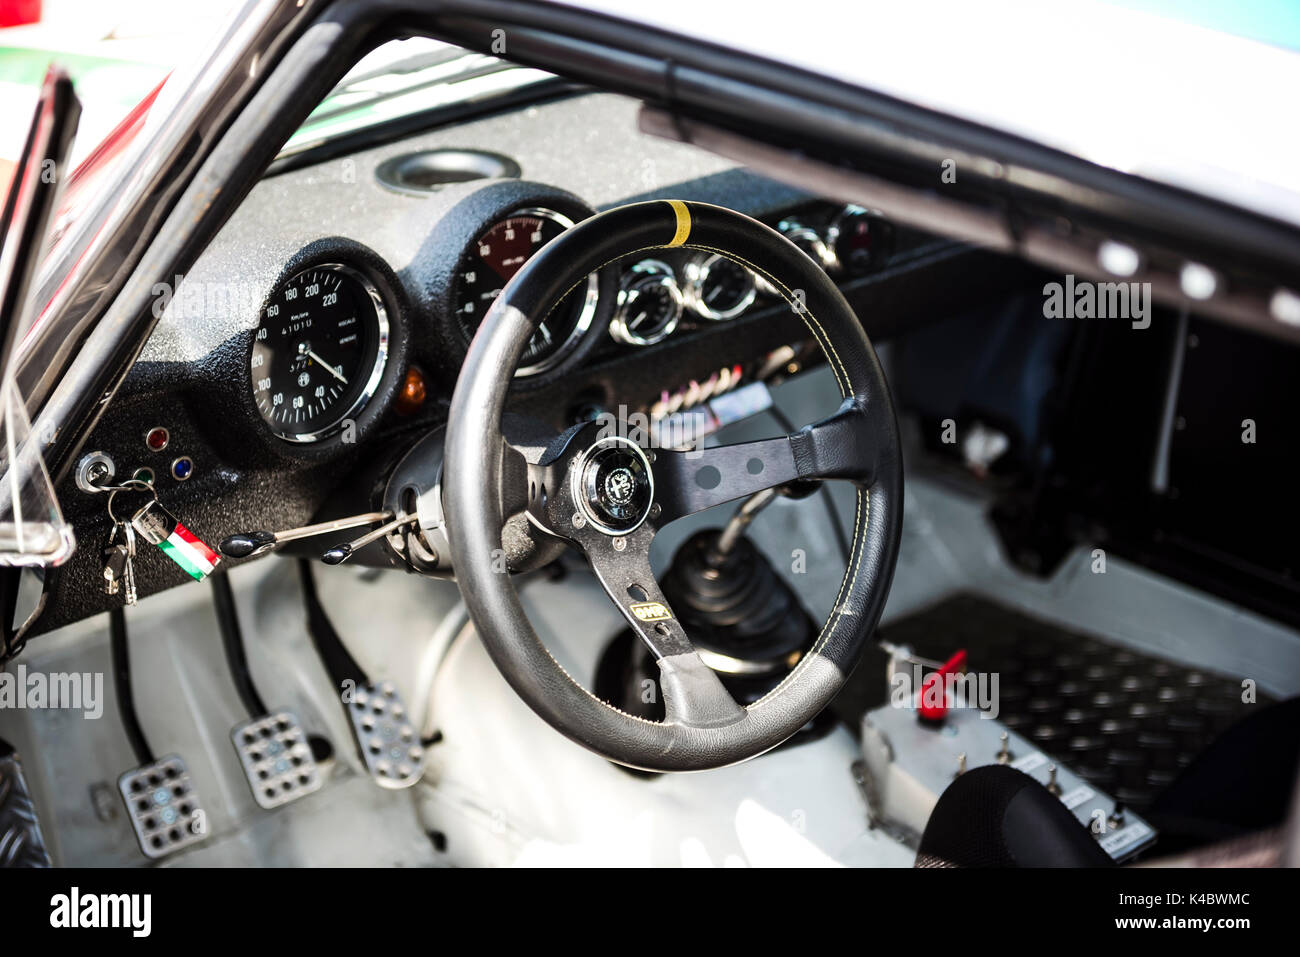 Alfa Romeo Gta Classic Race Car Interior Stock Photo 157613580